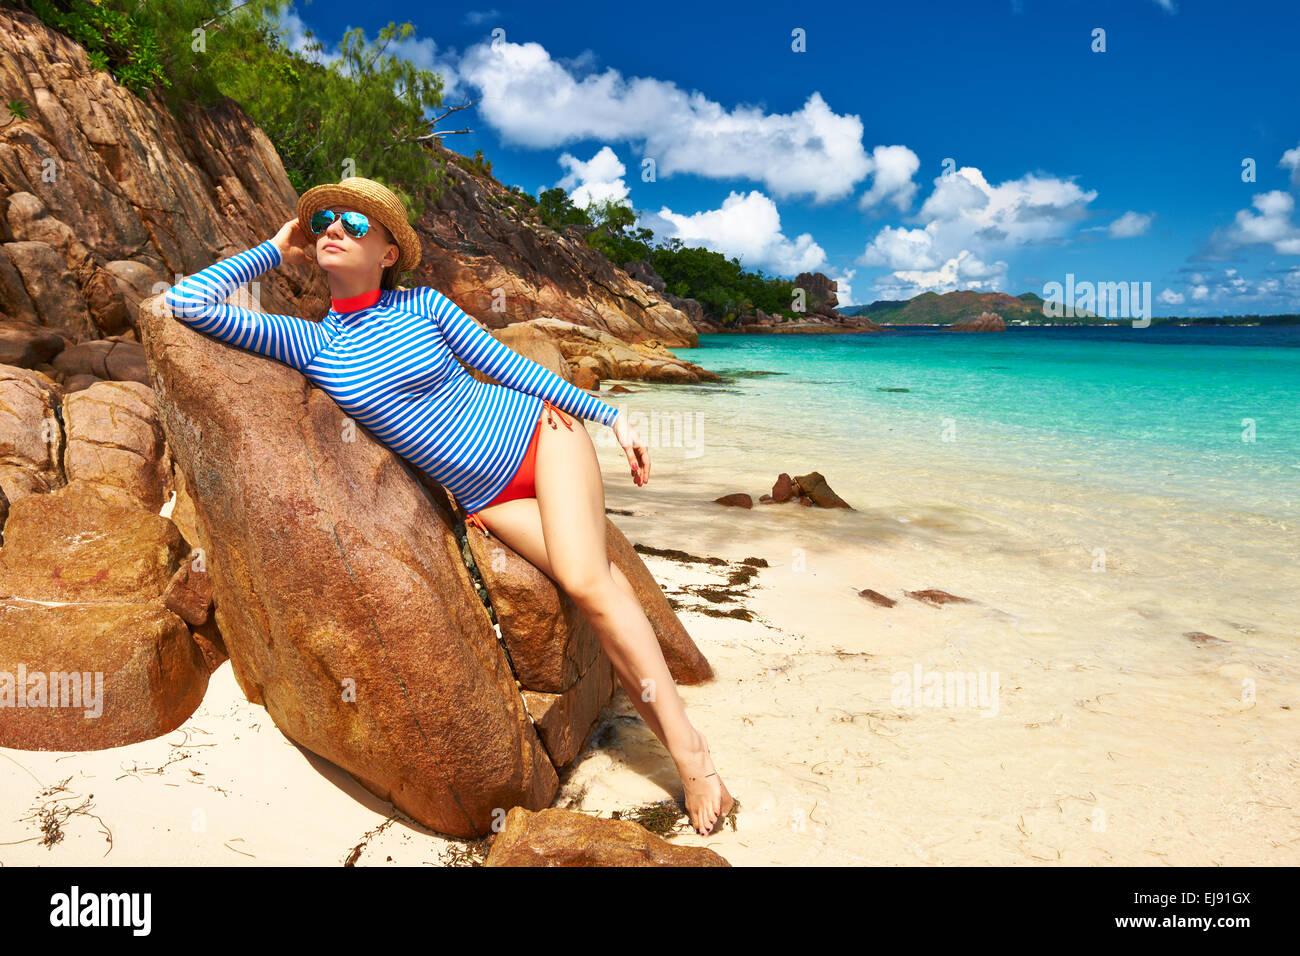 Woman at beautiful beach wearing rash guard - Stock Image